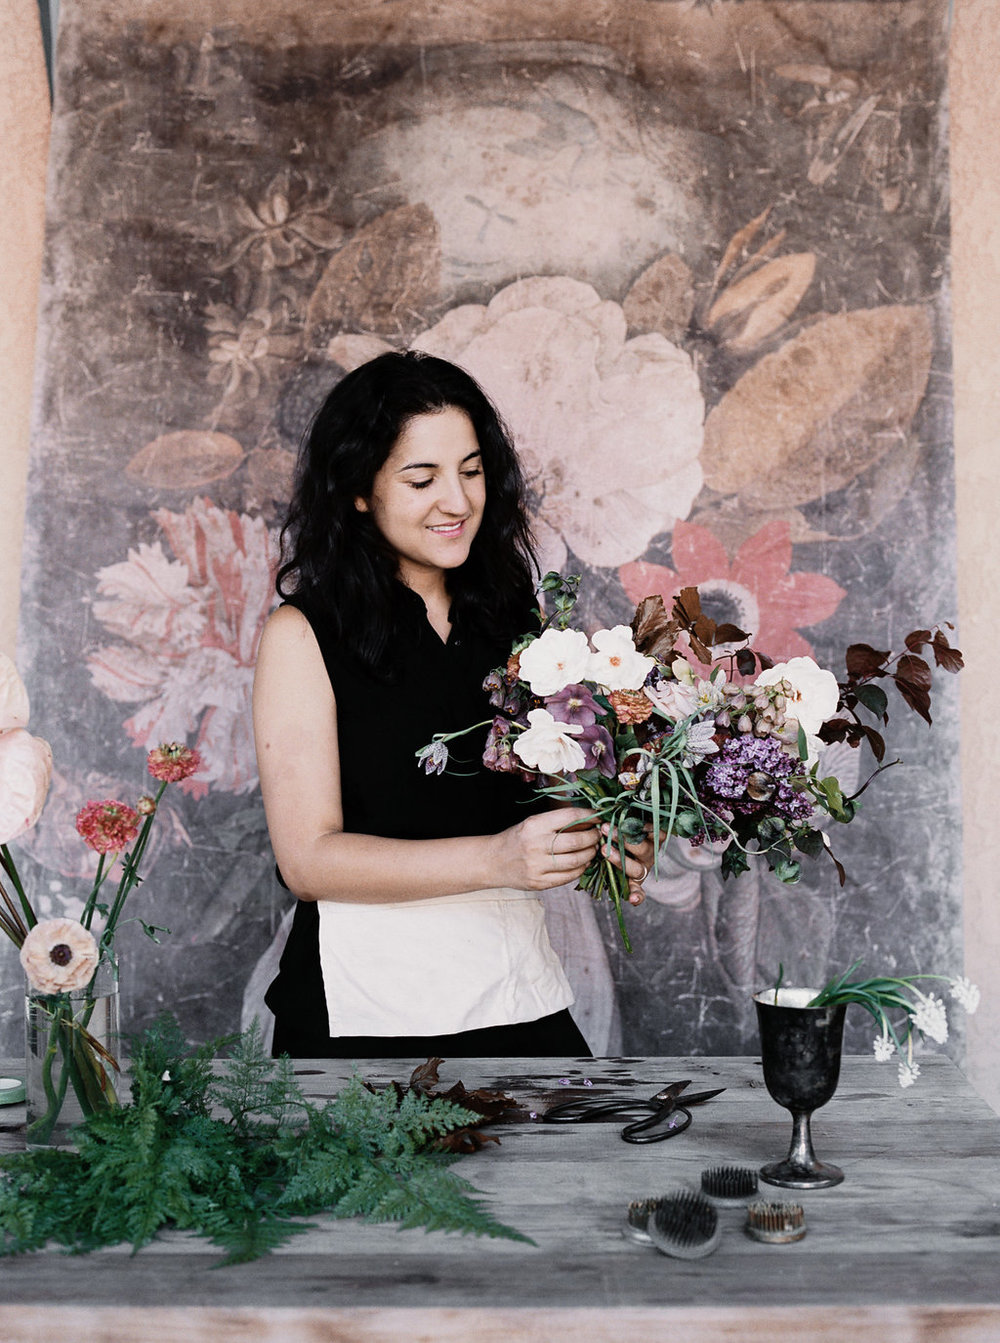 Amy-nicole-floral-lara-lam-41.jpg